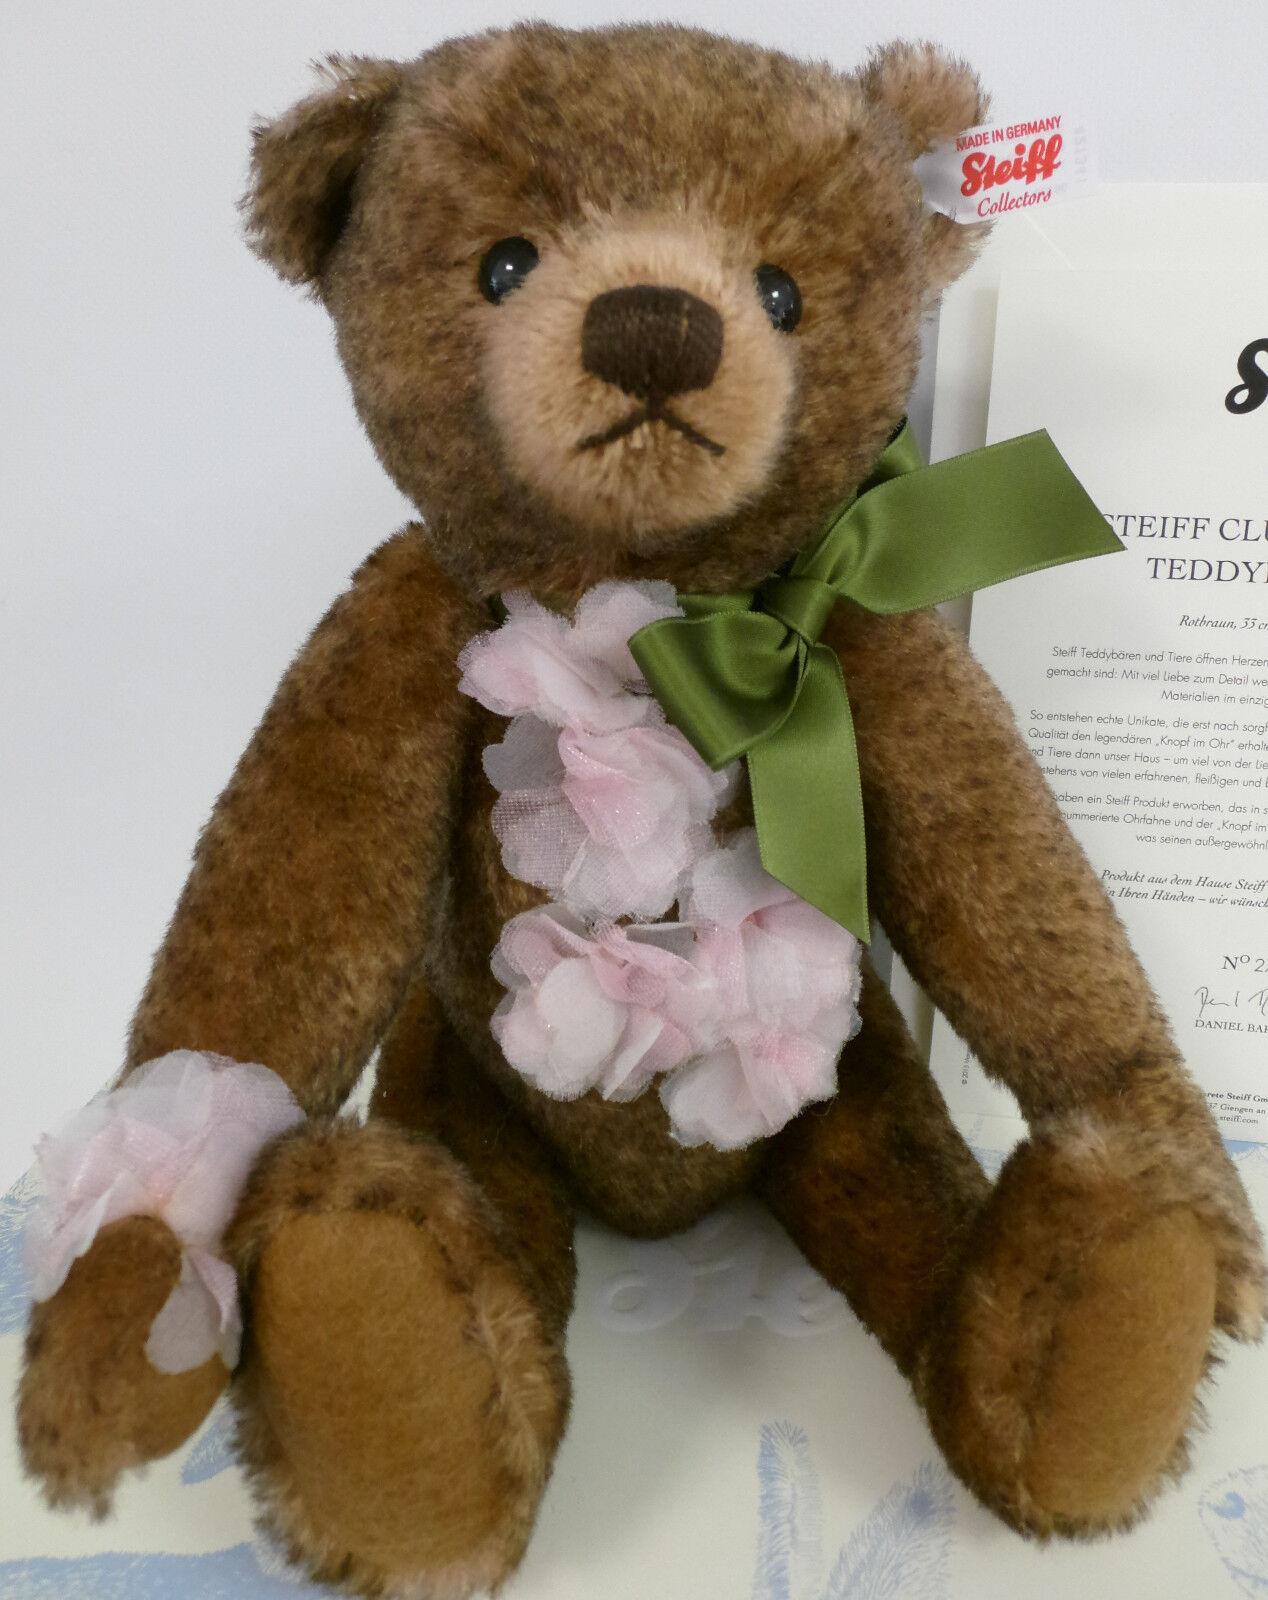 NEU Steiff 421341 Teddybär Cherry Mohair rotbraun 33 cm limitierte Auflage